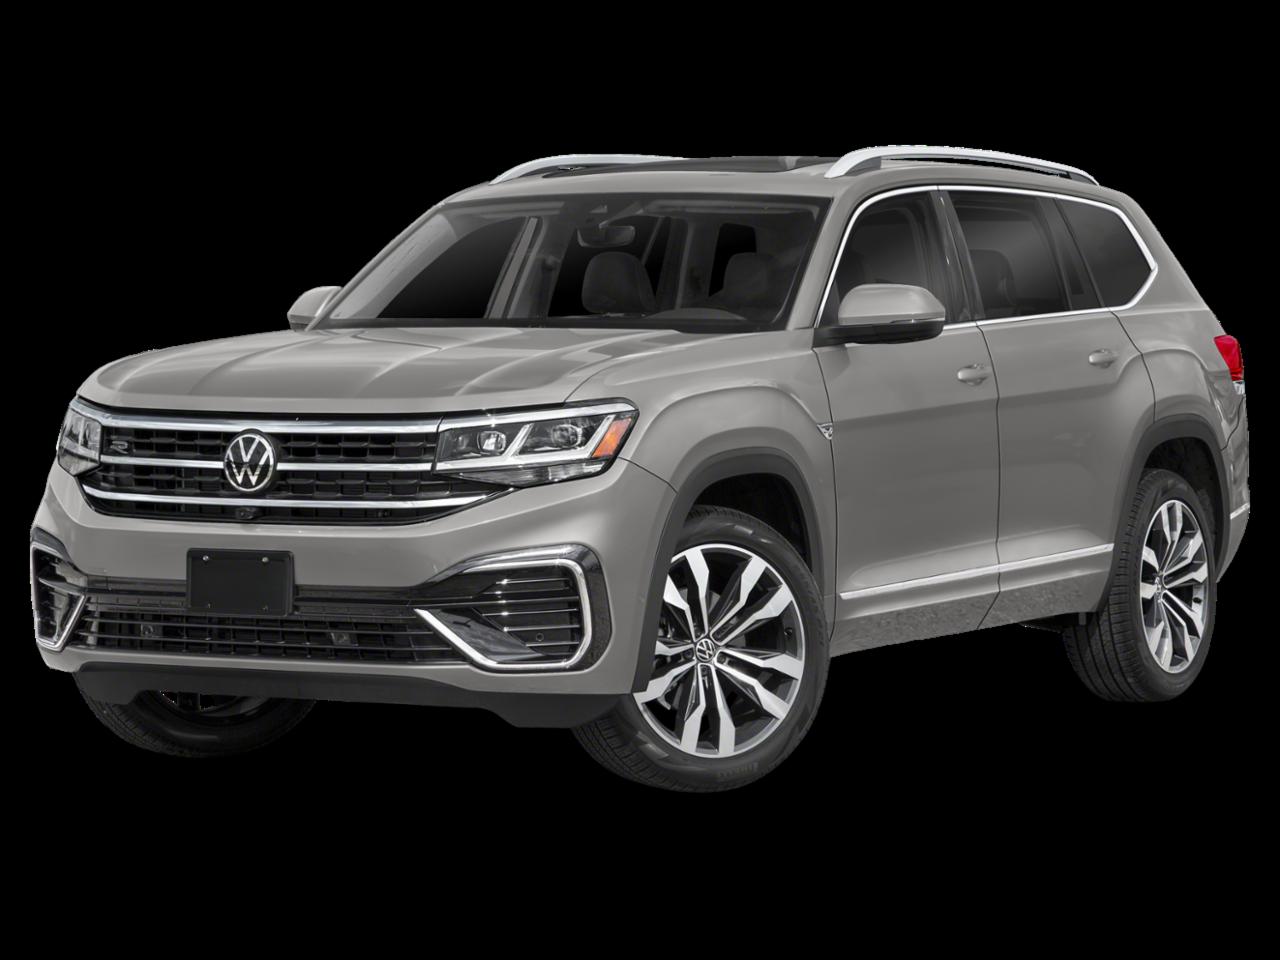 Volkswagen 2021 Atlas 3.6L V6 SEL R-Line